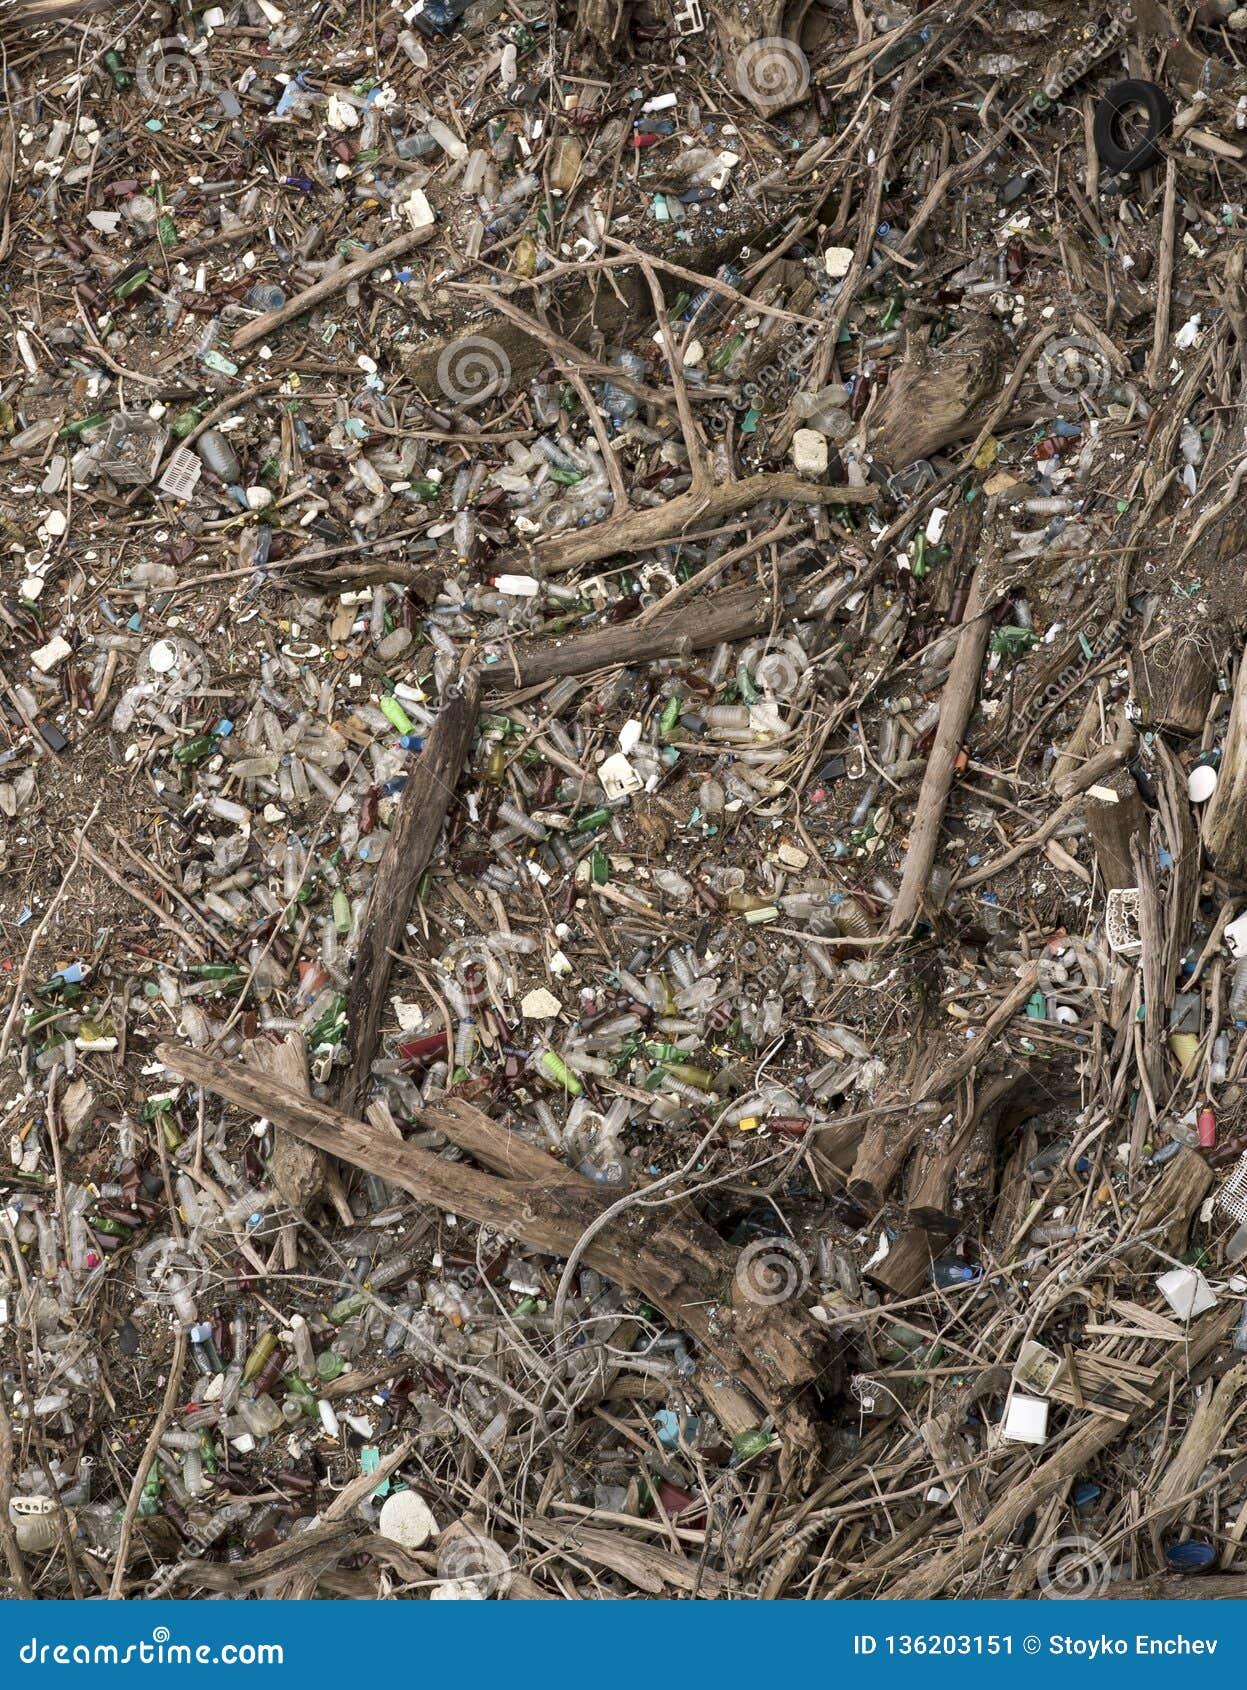 Environnement fortement pollué